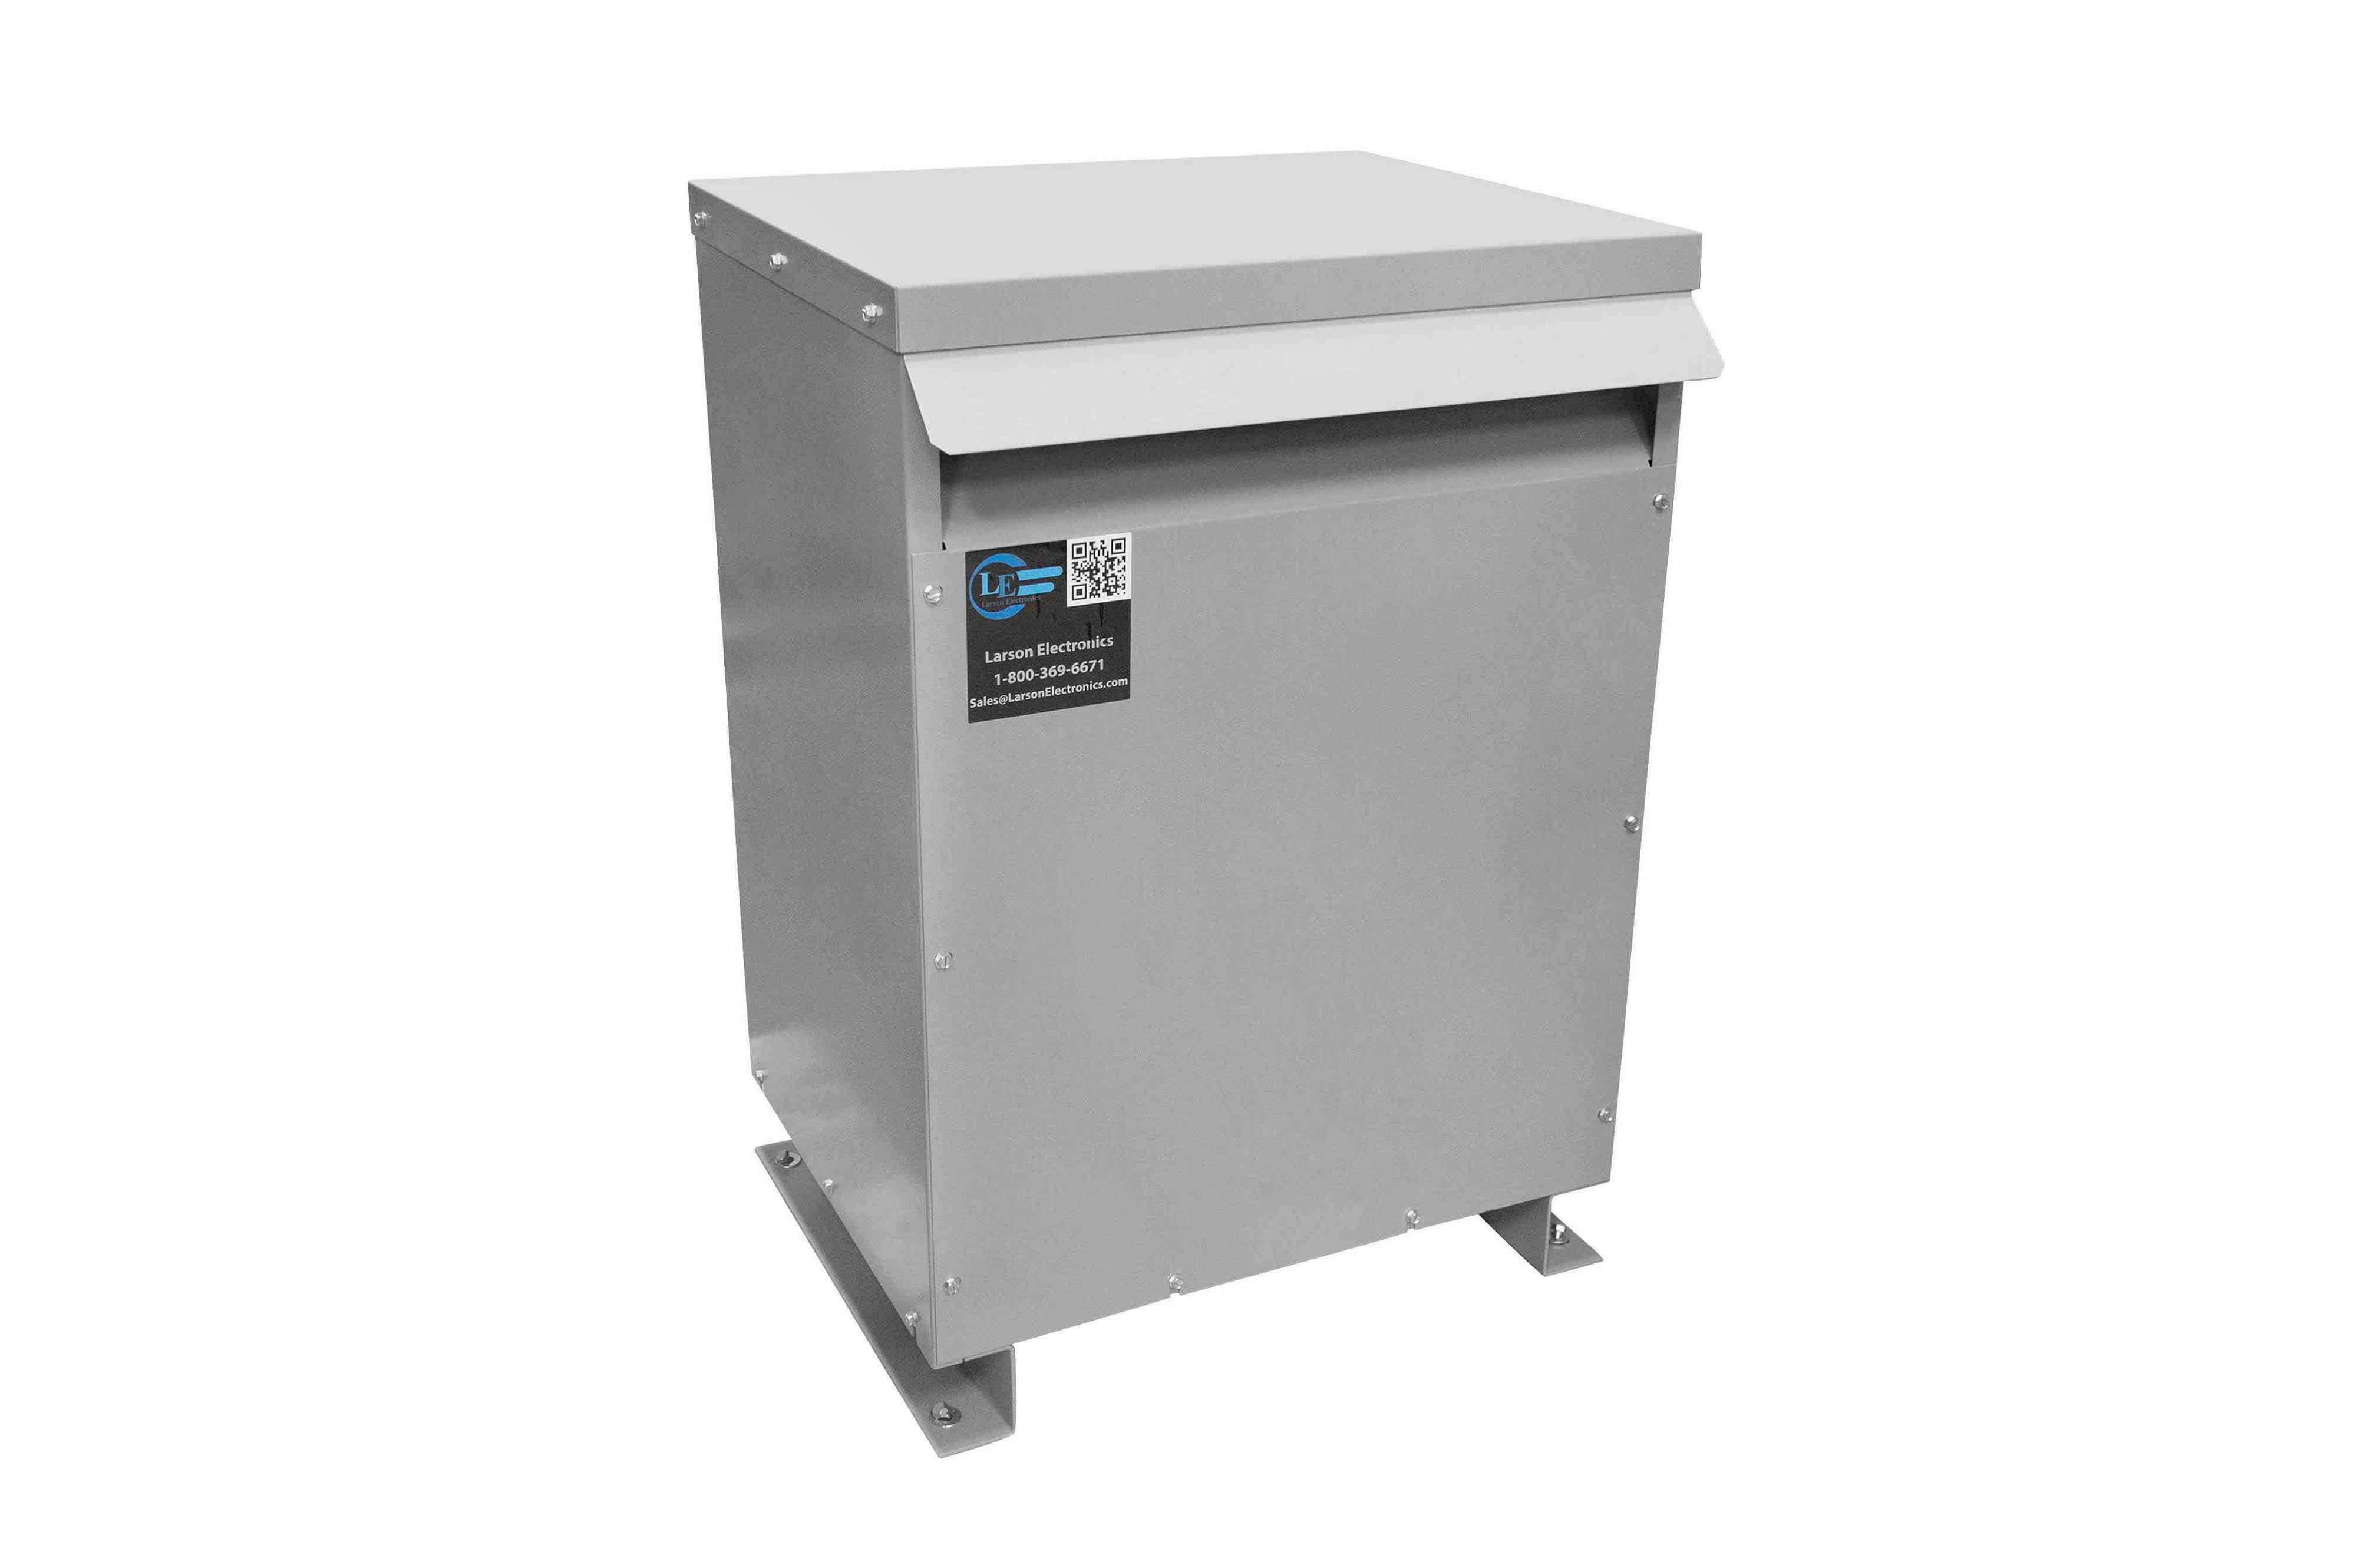 125 kVA 3PH Isolation Transformer, 415V Wye Primary, 480V Delta Secondary, N3R, Ventilated, 60 Hz